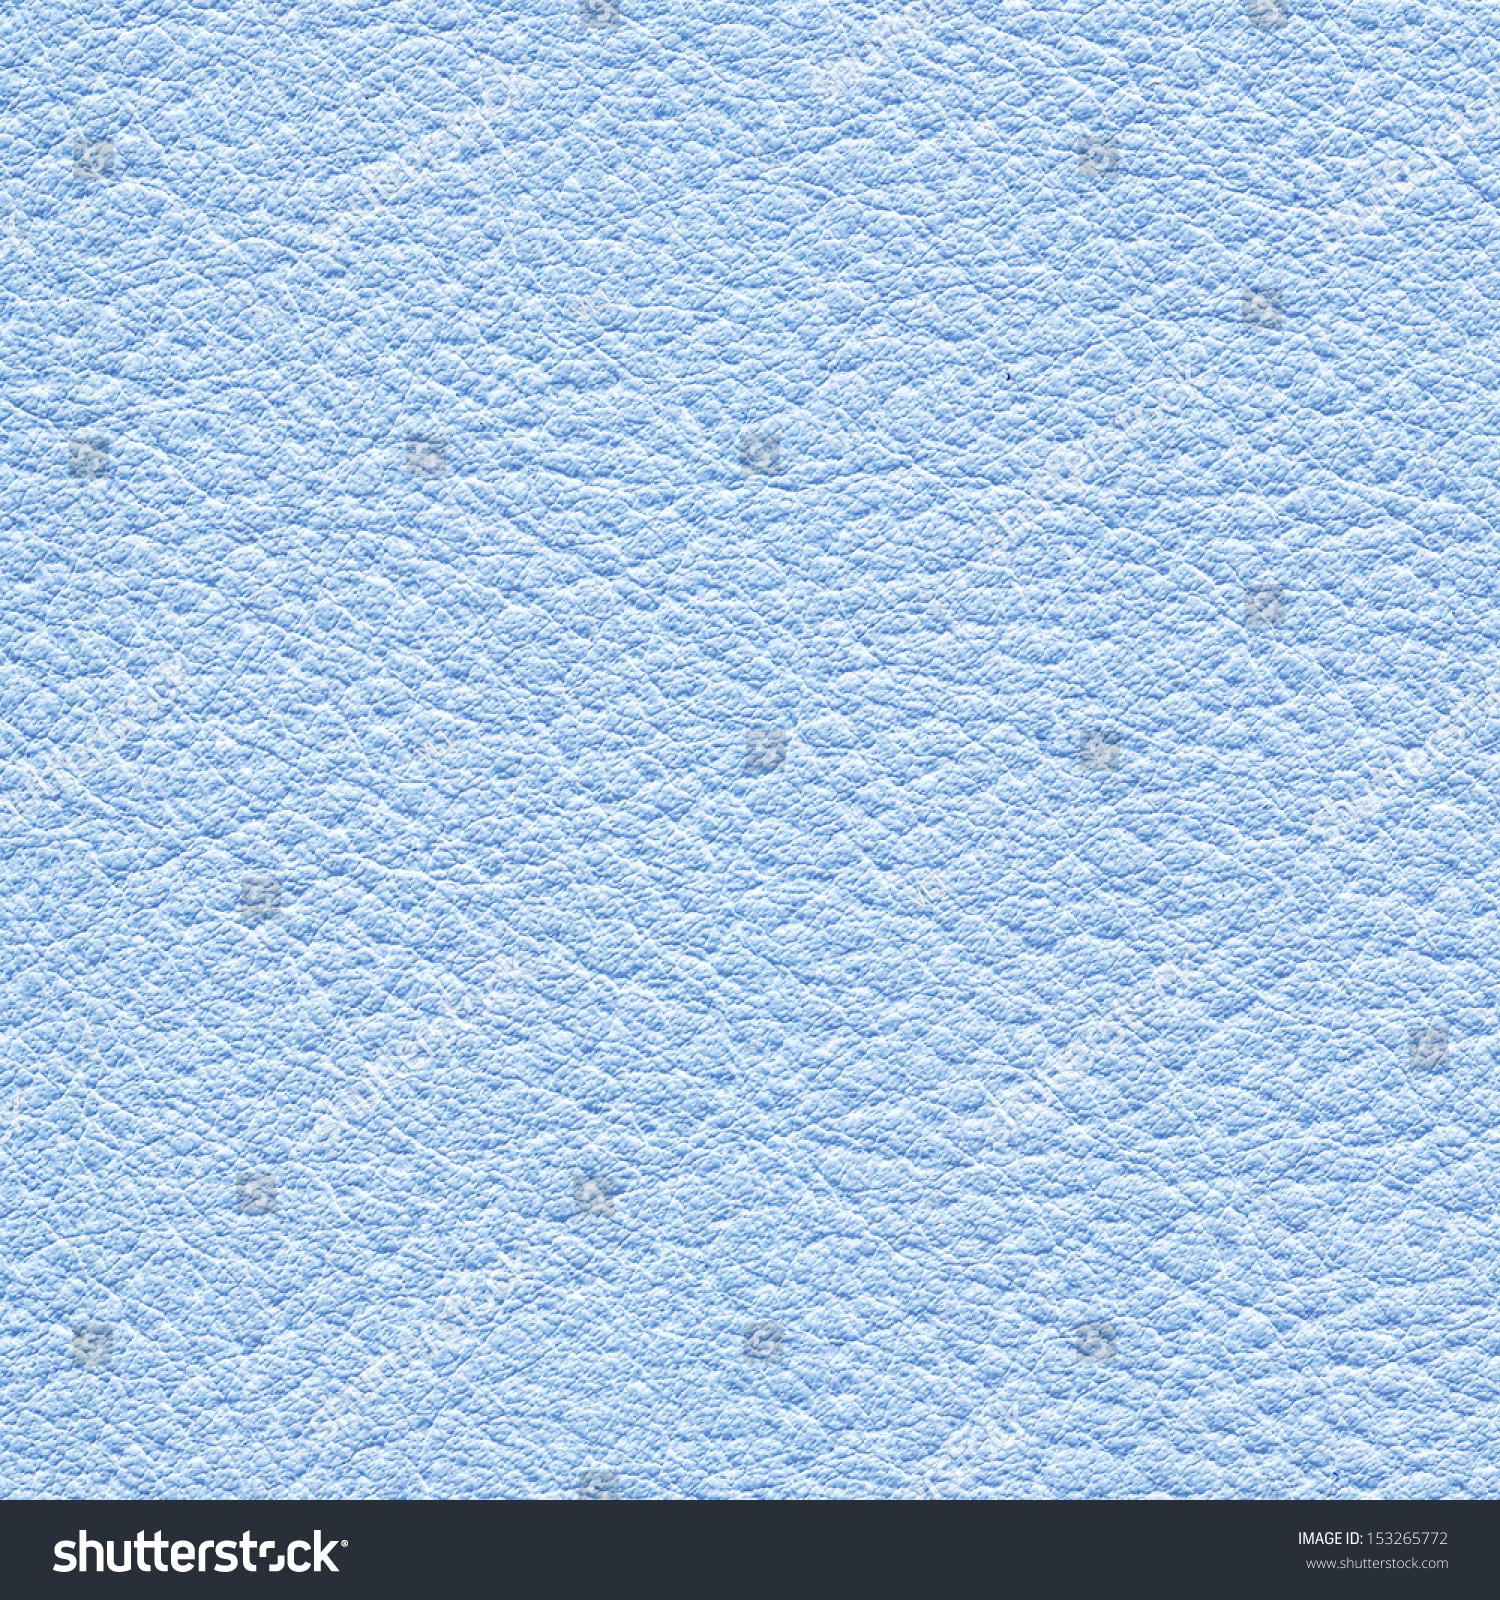 light blue leather background - photo #13